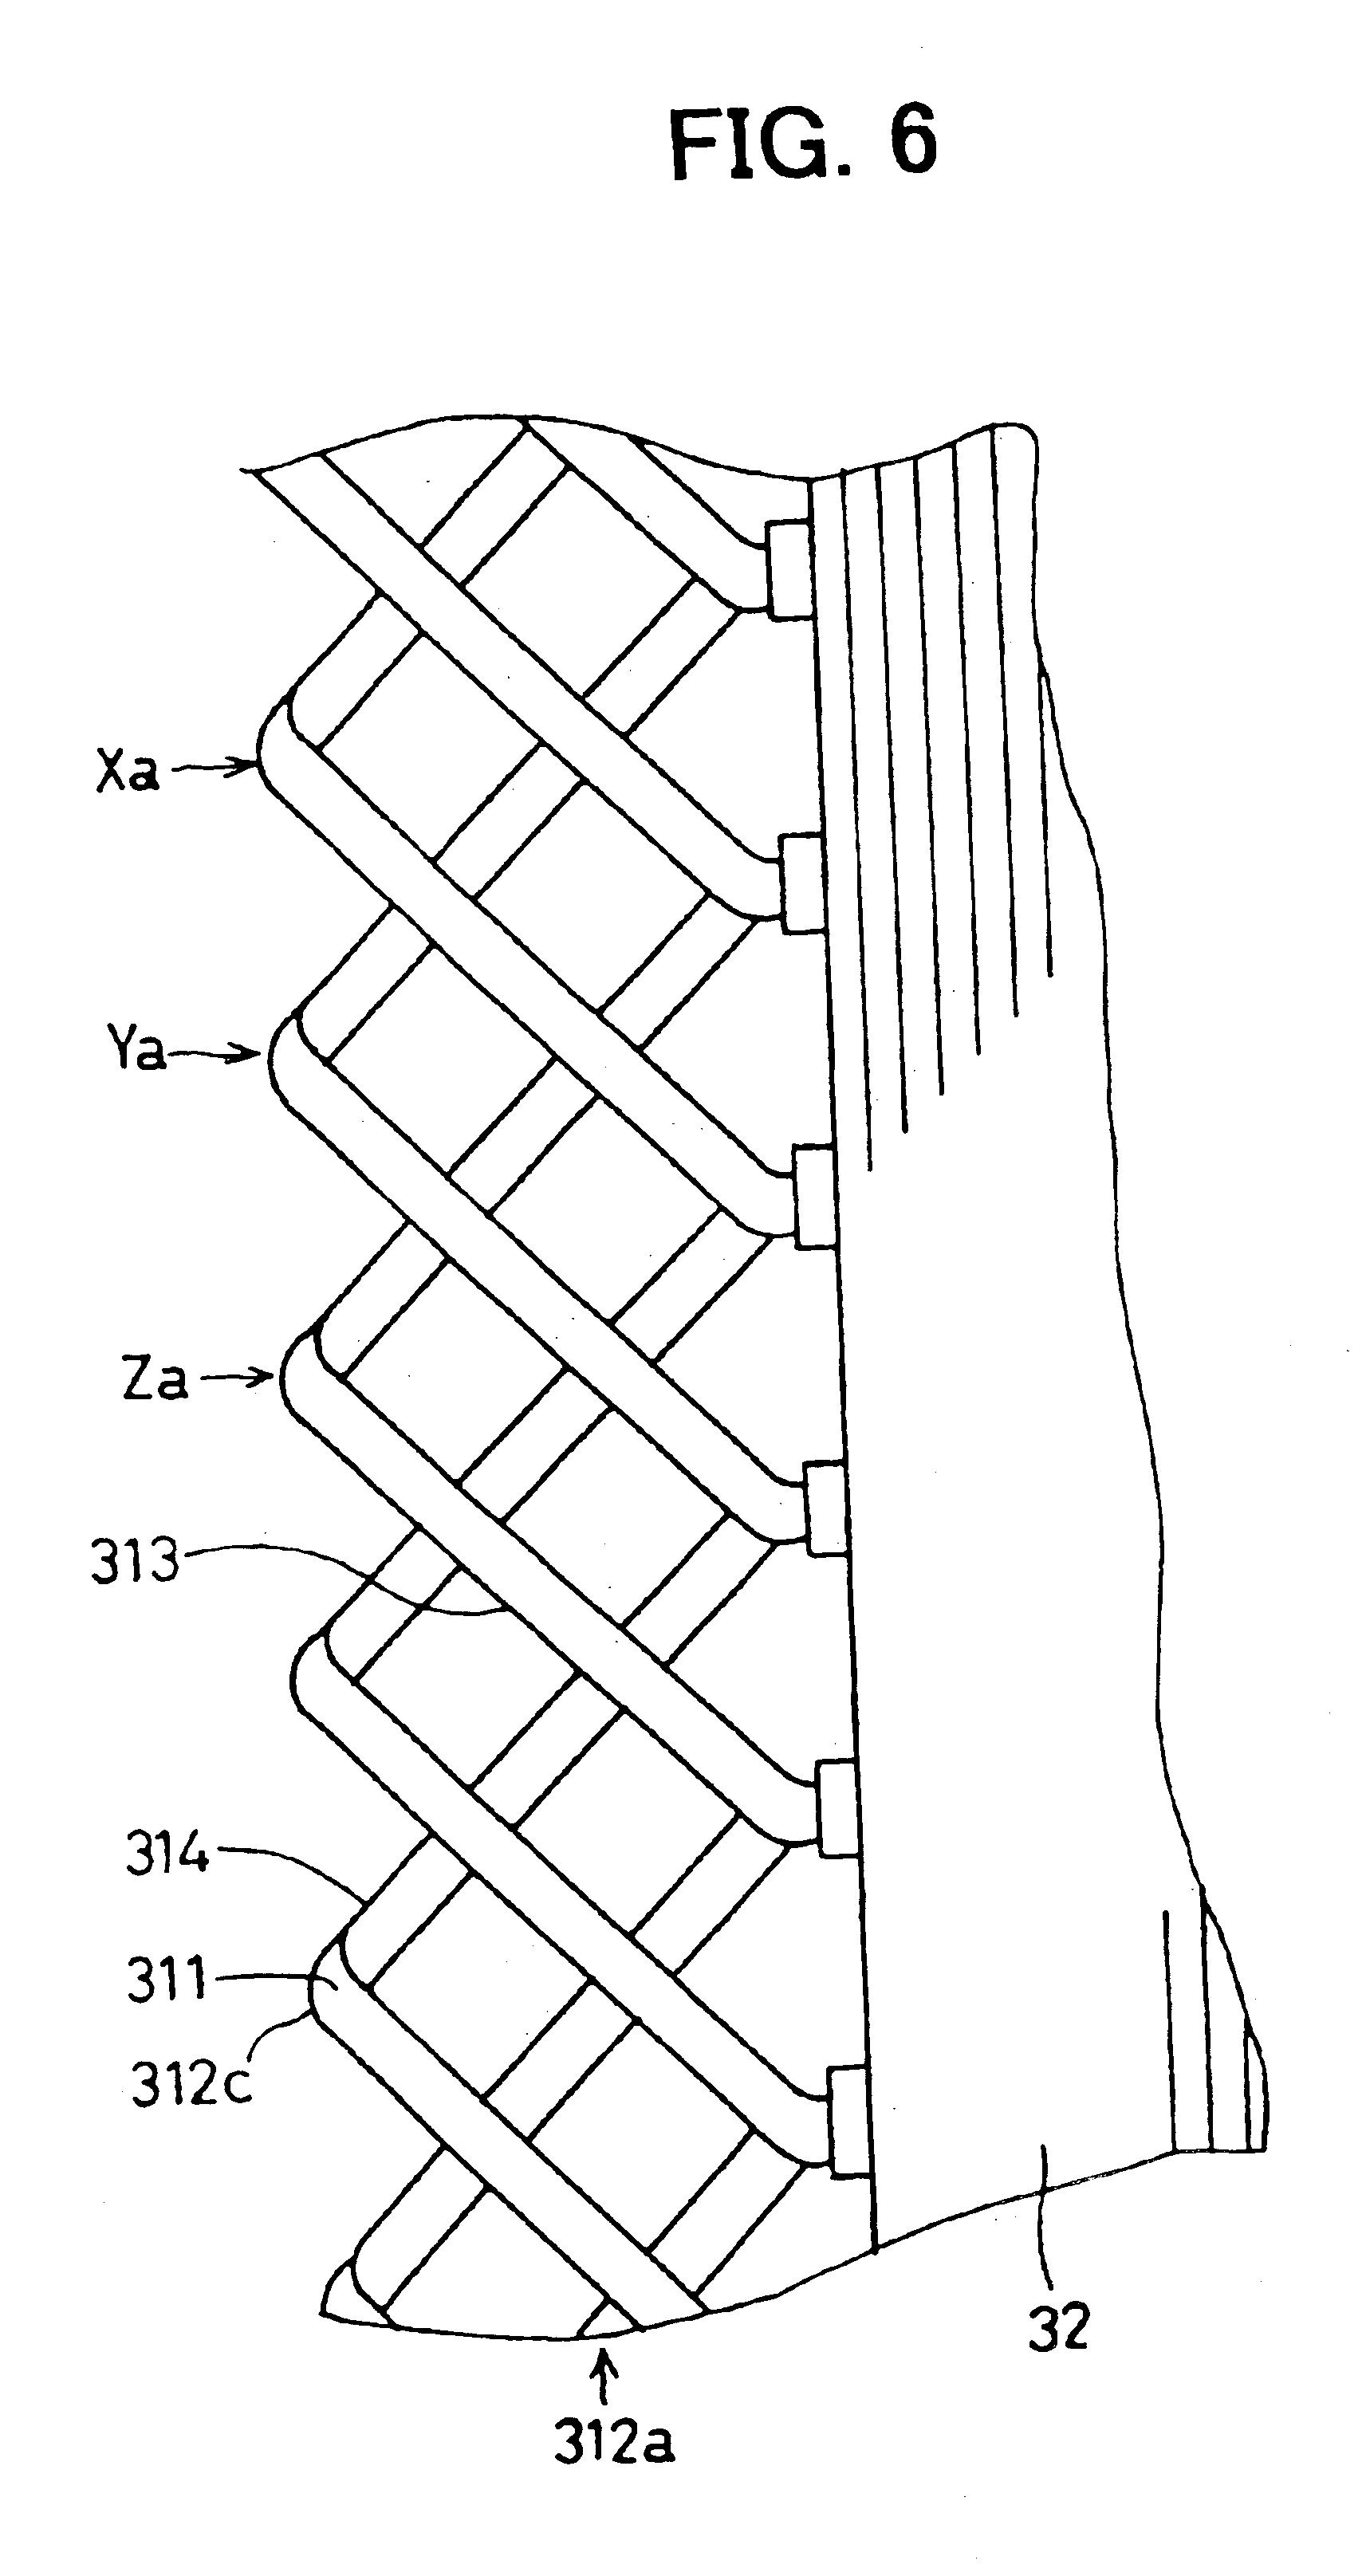 prestolite 8rg2112 alternator wiring diagram leece neville Cat 3126 Accessories prestolite rg alternator wiring diagram prestolite prestolite rg alternator wiring diagram us06943477 20050913 d00006